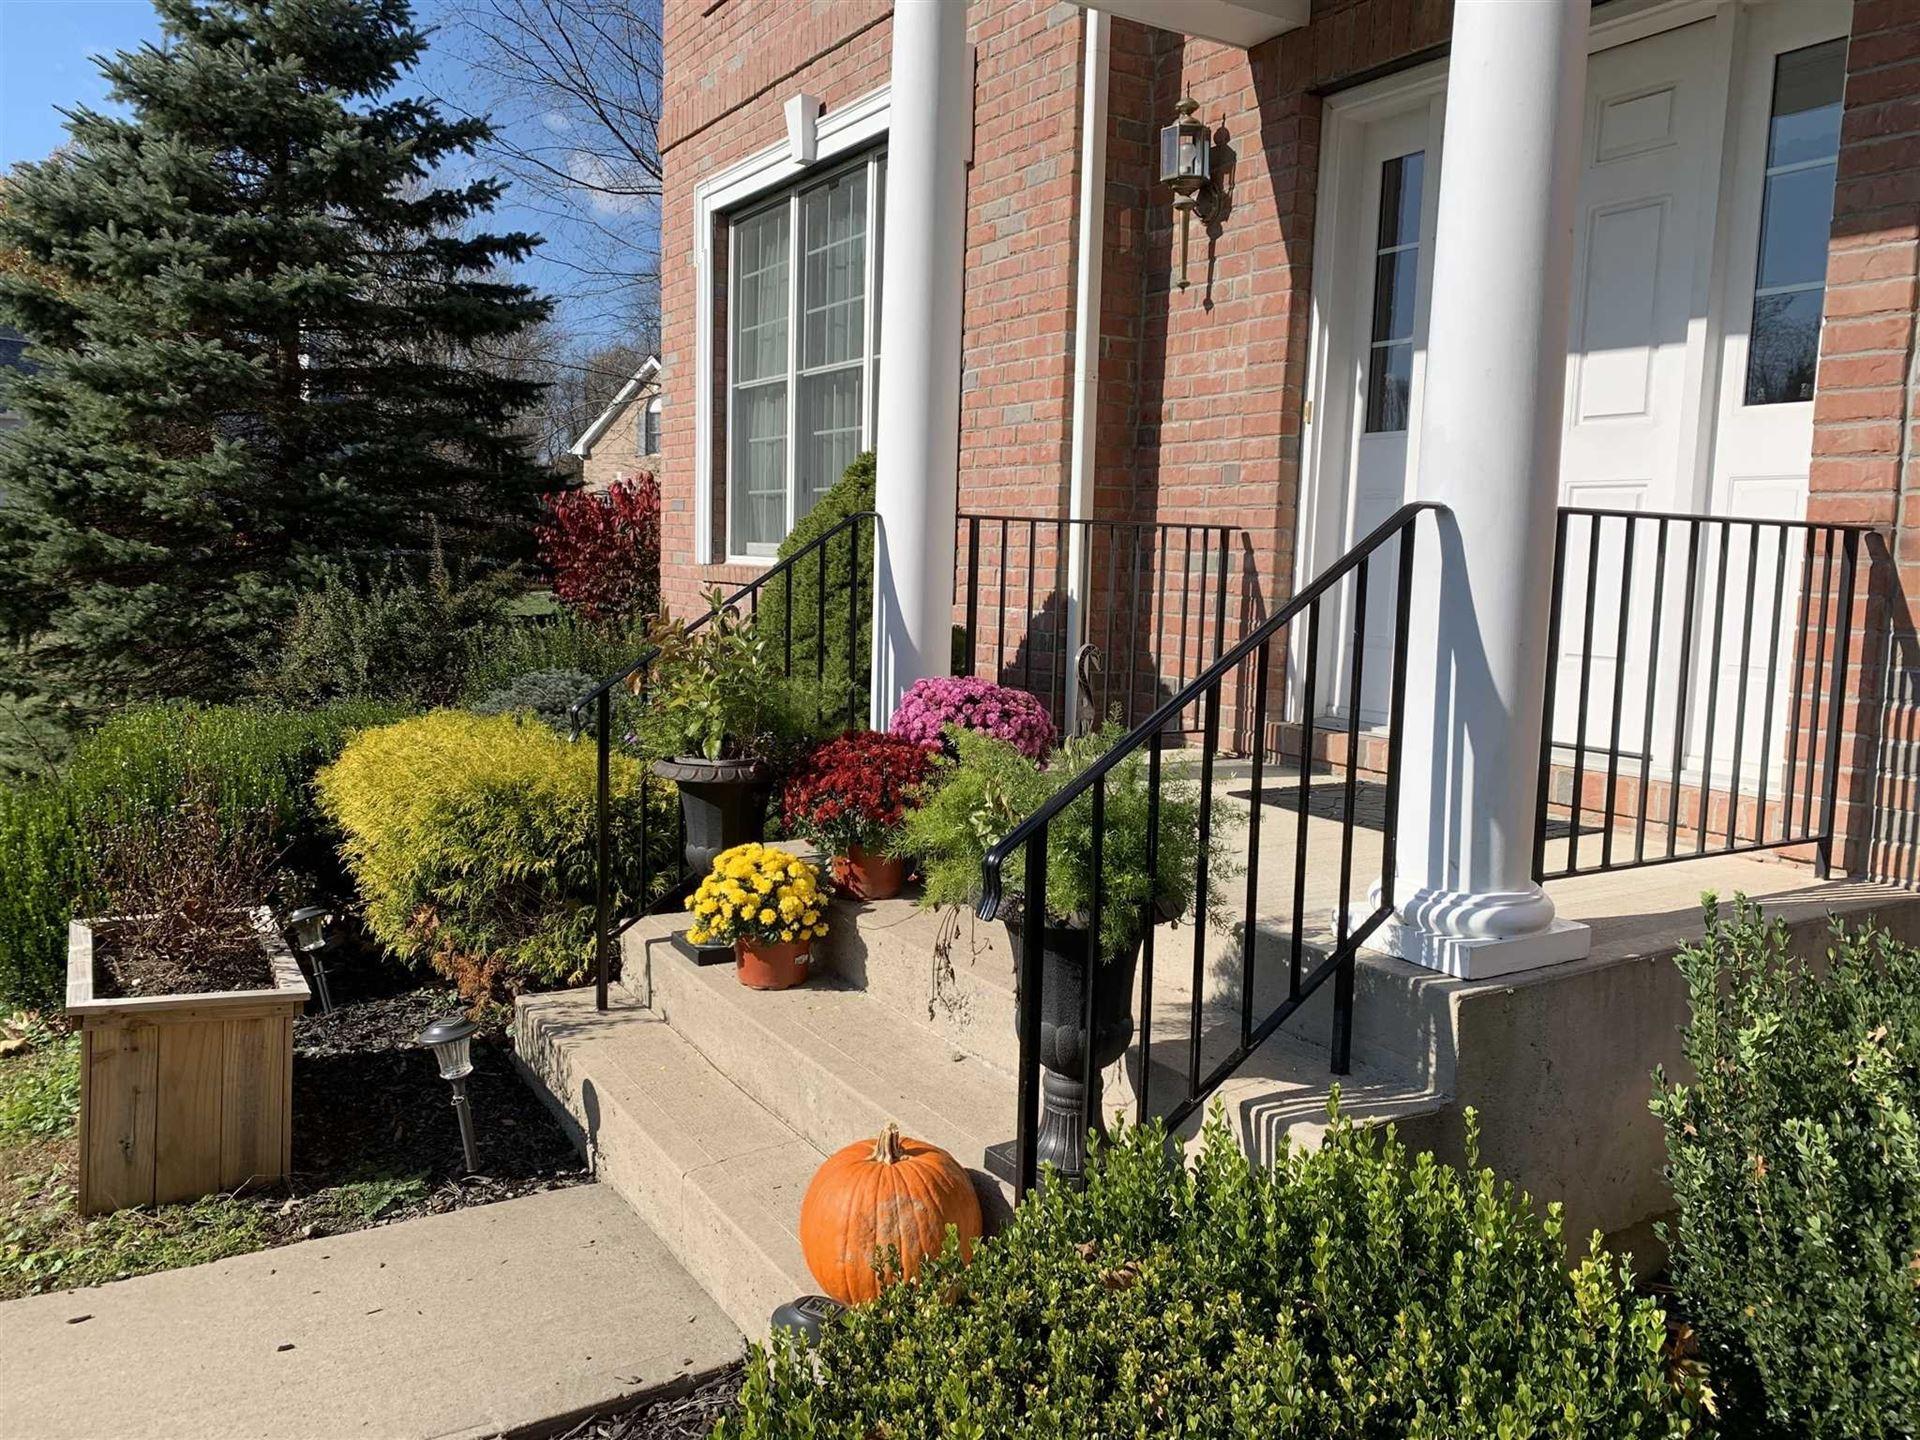 64 CREEKSIDE RD, East Fishkill, NY 12533 - #: 391360